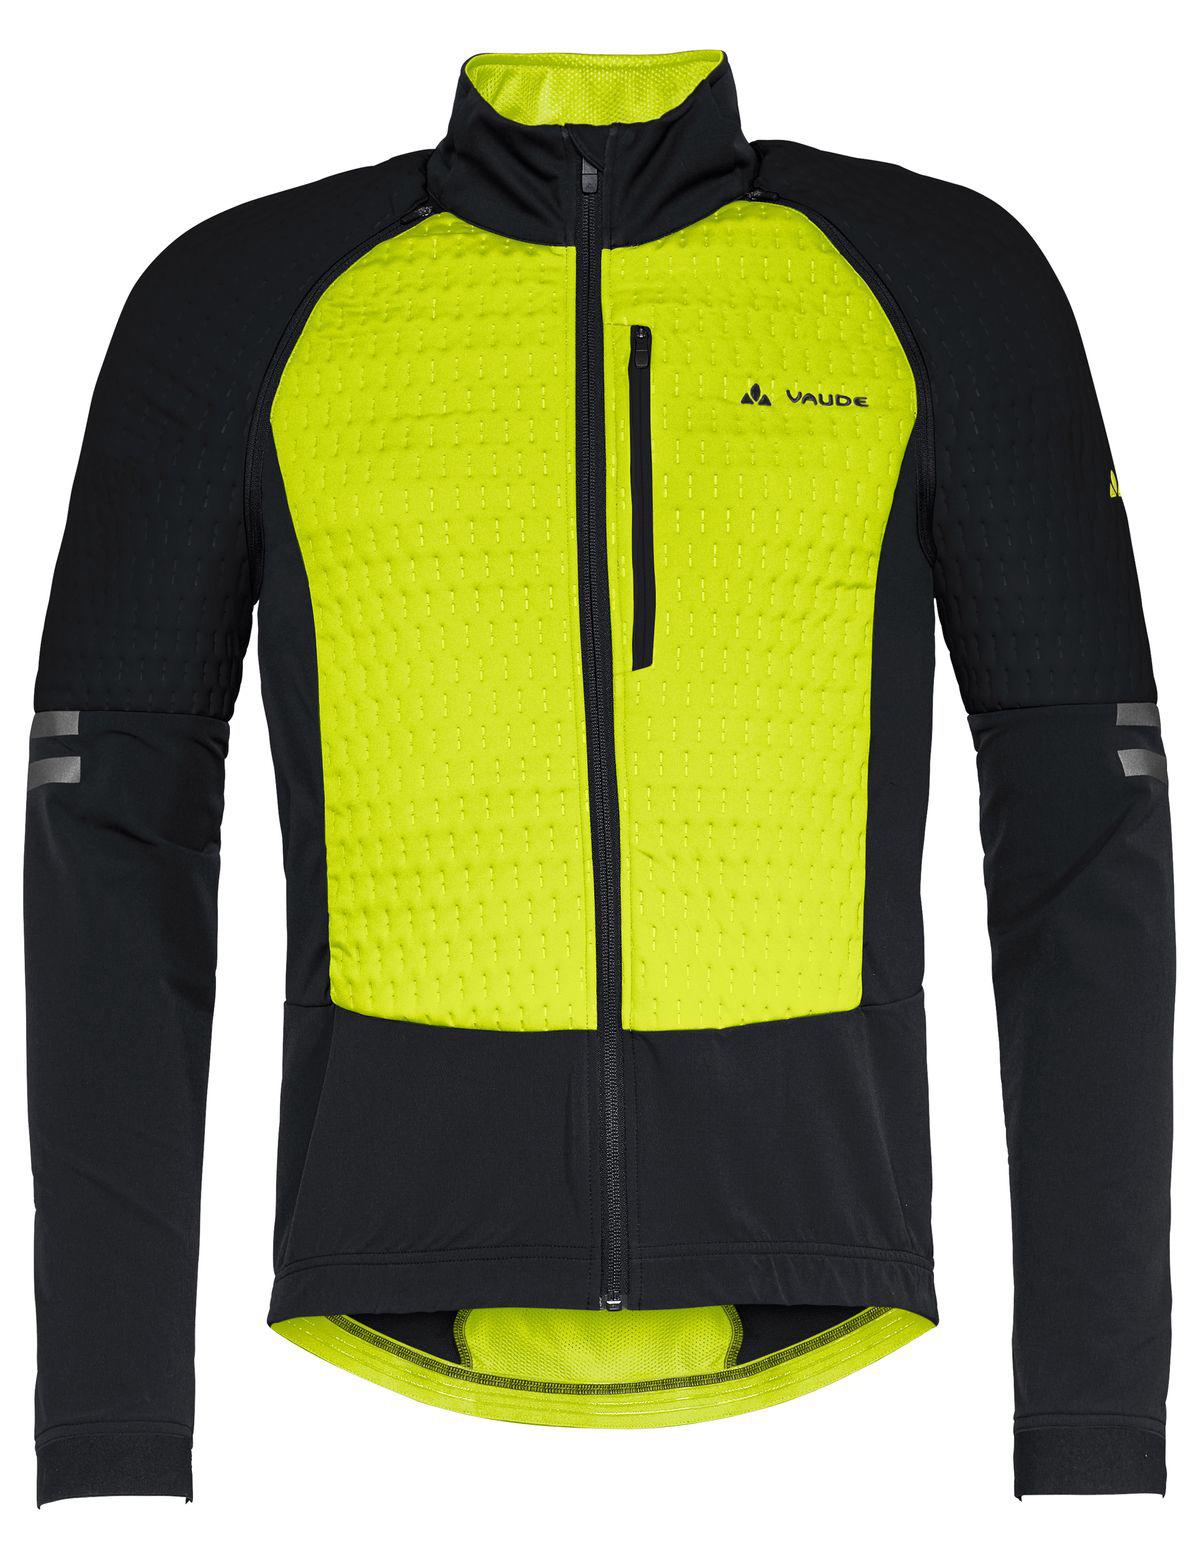 Vaude Men's Pro Insulation ZO Jacket - bright green